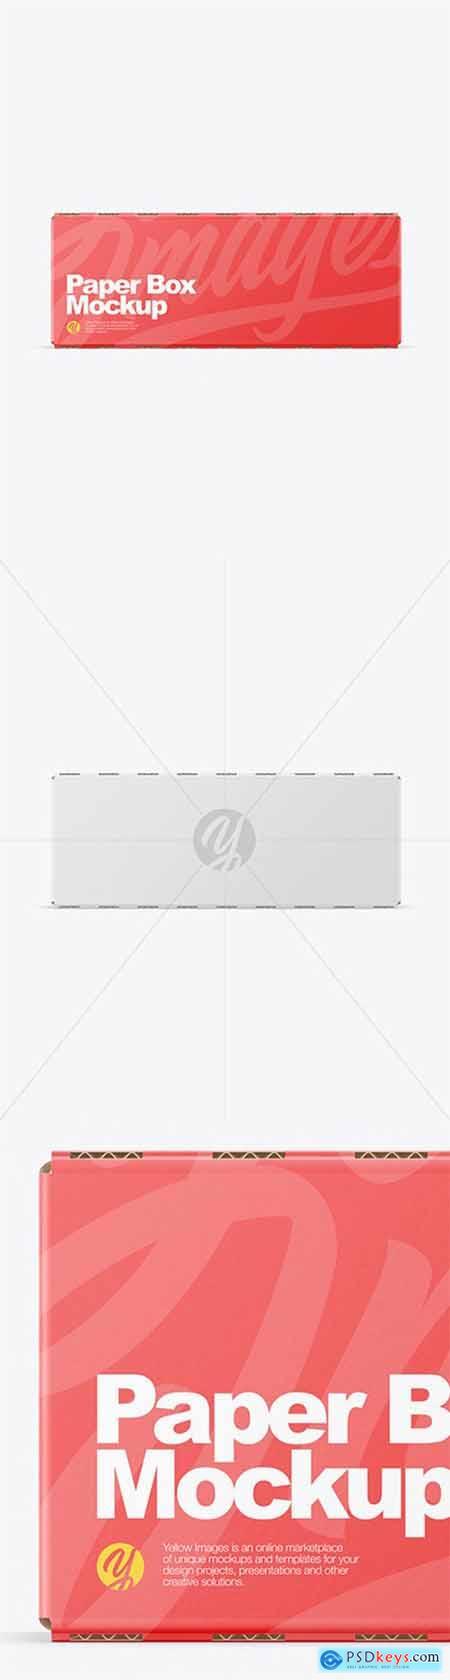 Paper Box Mockup 51960